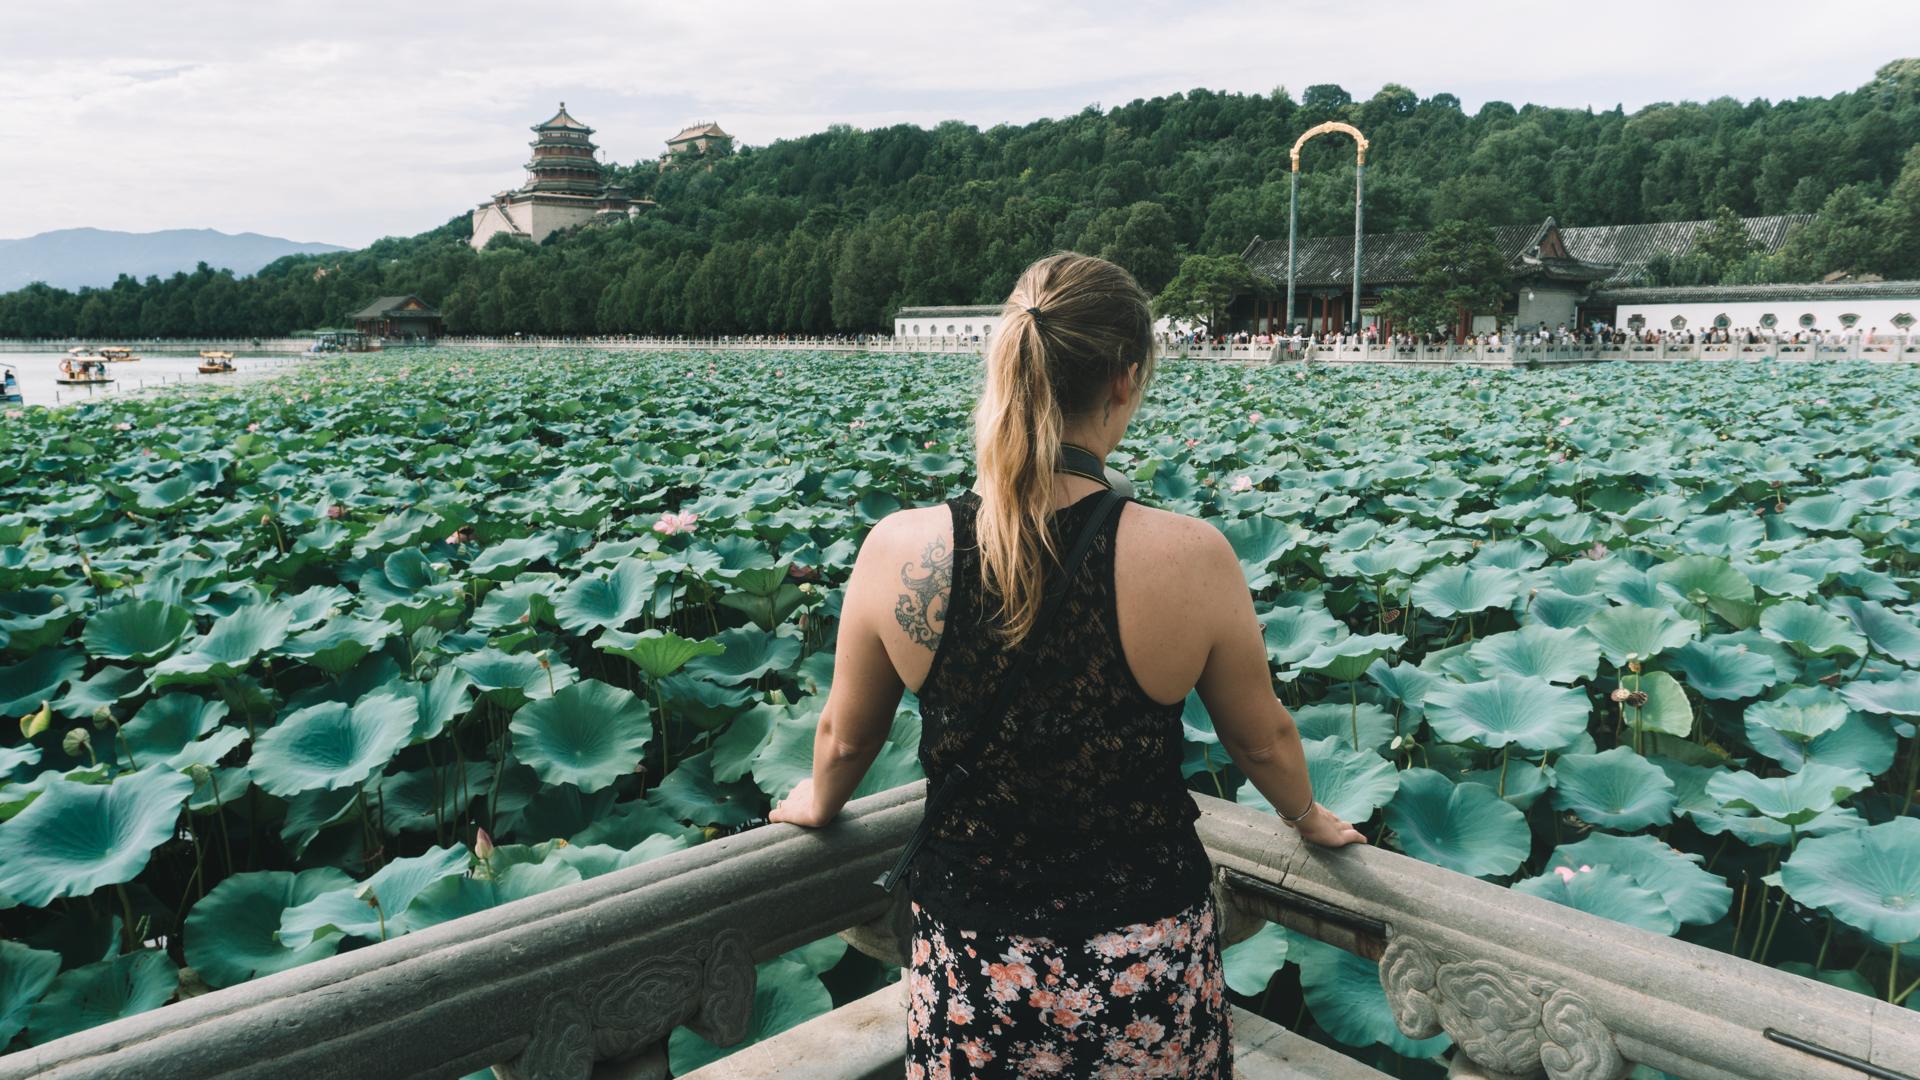 DSC09339_pechino_summer_palace_travel_psych_chiara_cina_china